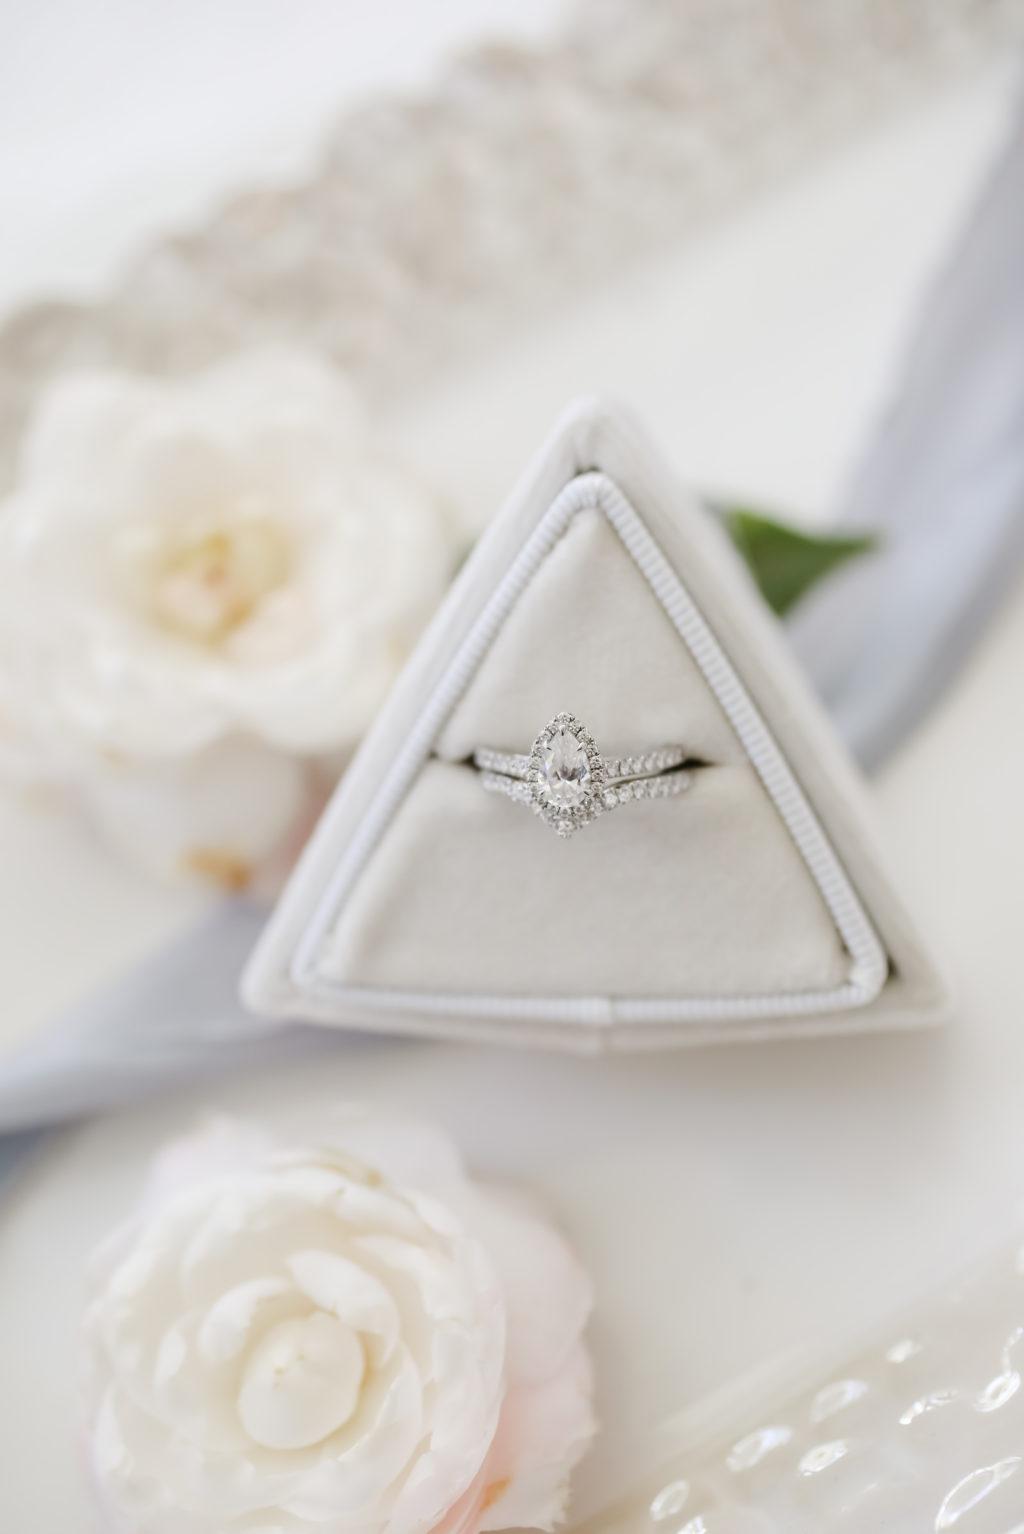 Pear Diamond Engagement Ring with Halo in Triangular Gray Ring Box | Tampa Bay Wedding Photographer Lifelong Photography Studio